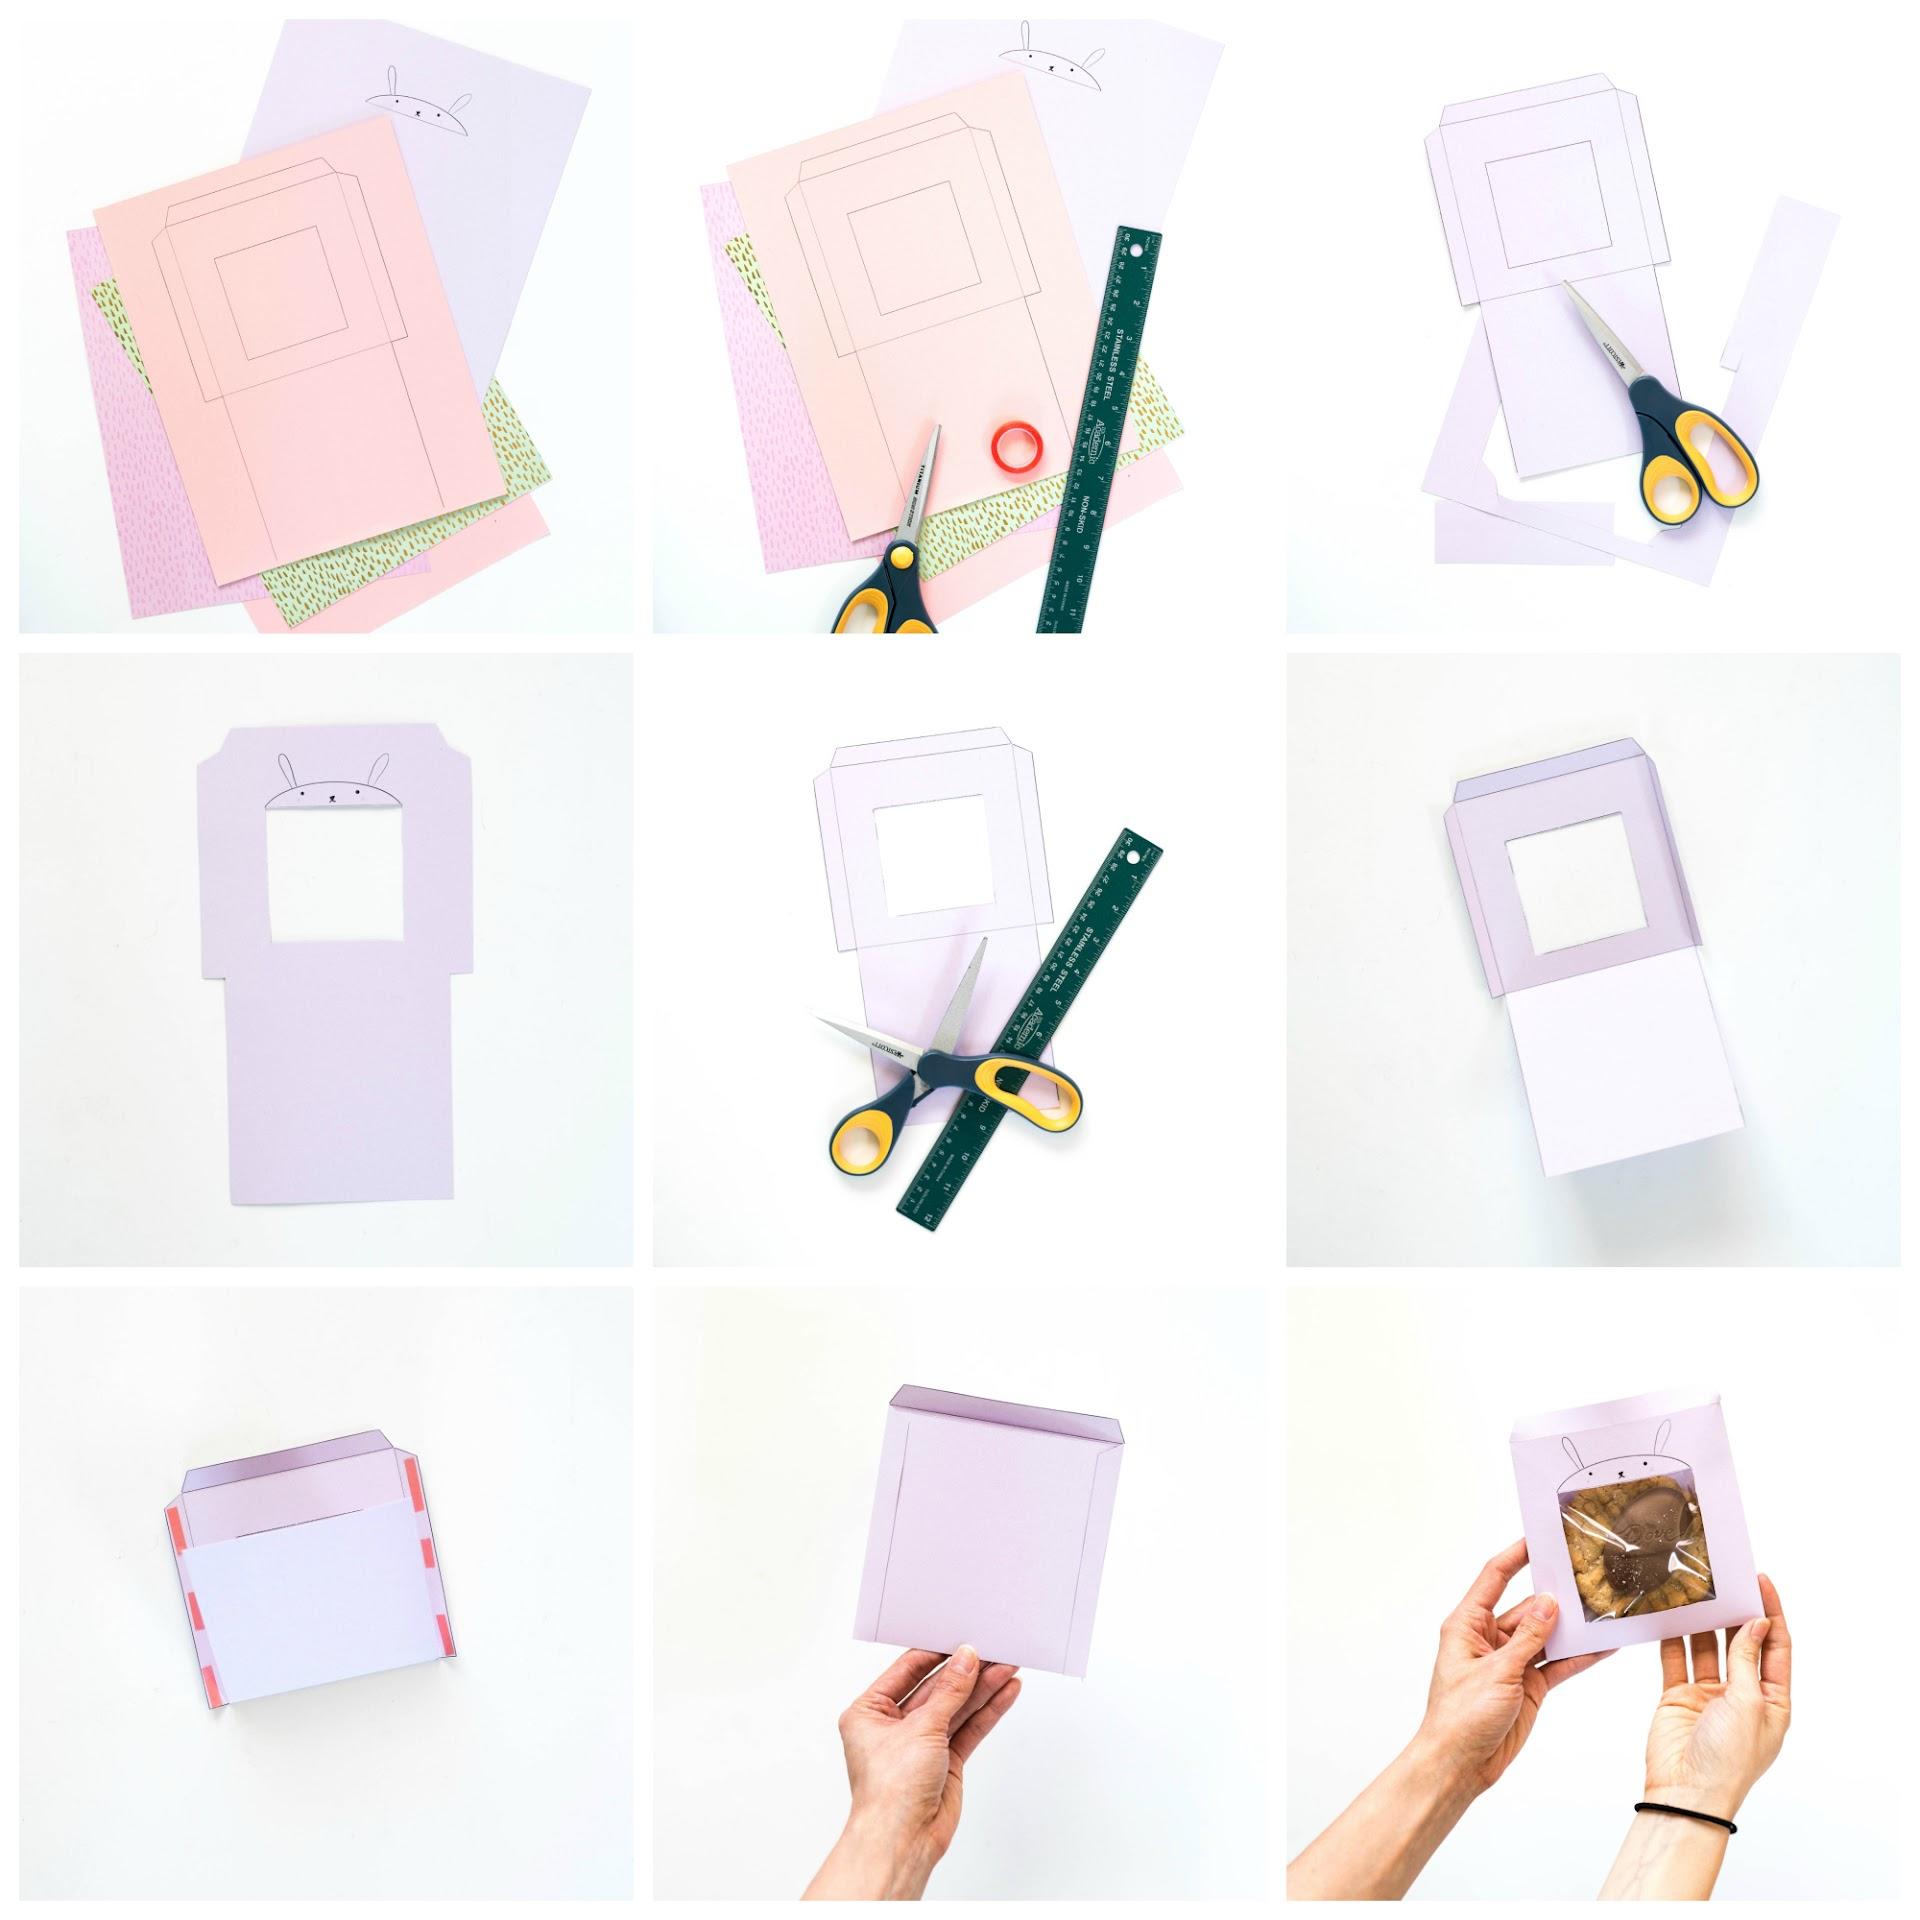 template, diy, craft, bunny, easter, rabbit, kids, ideas, purple, easy, dessert bag, kawaii